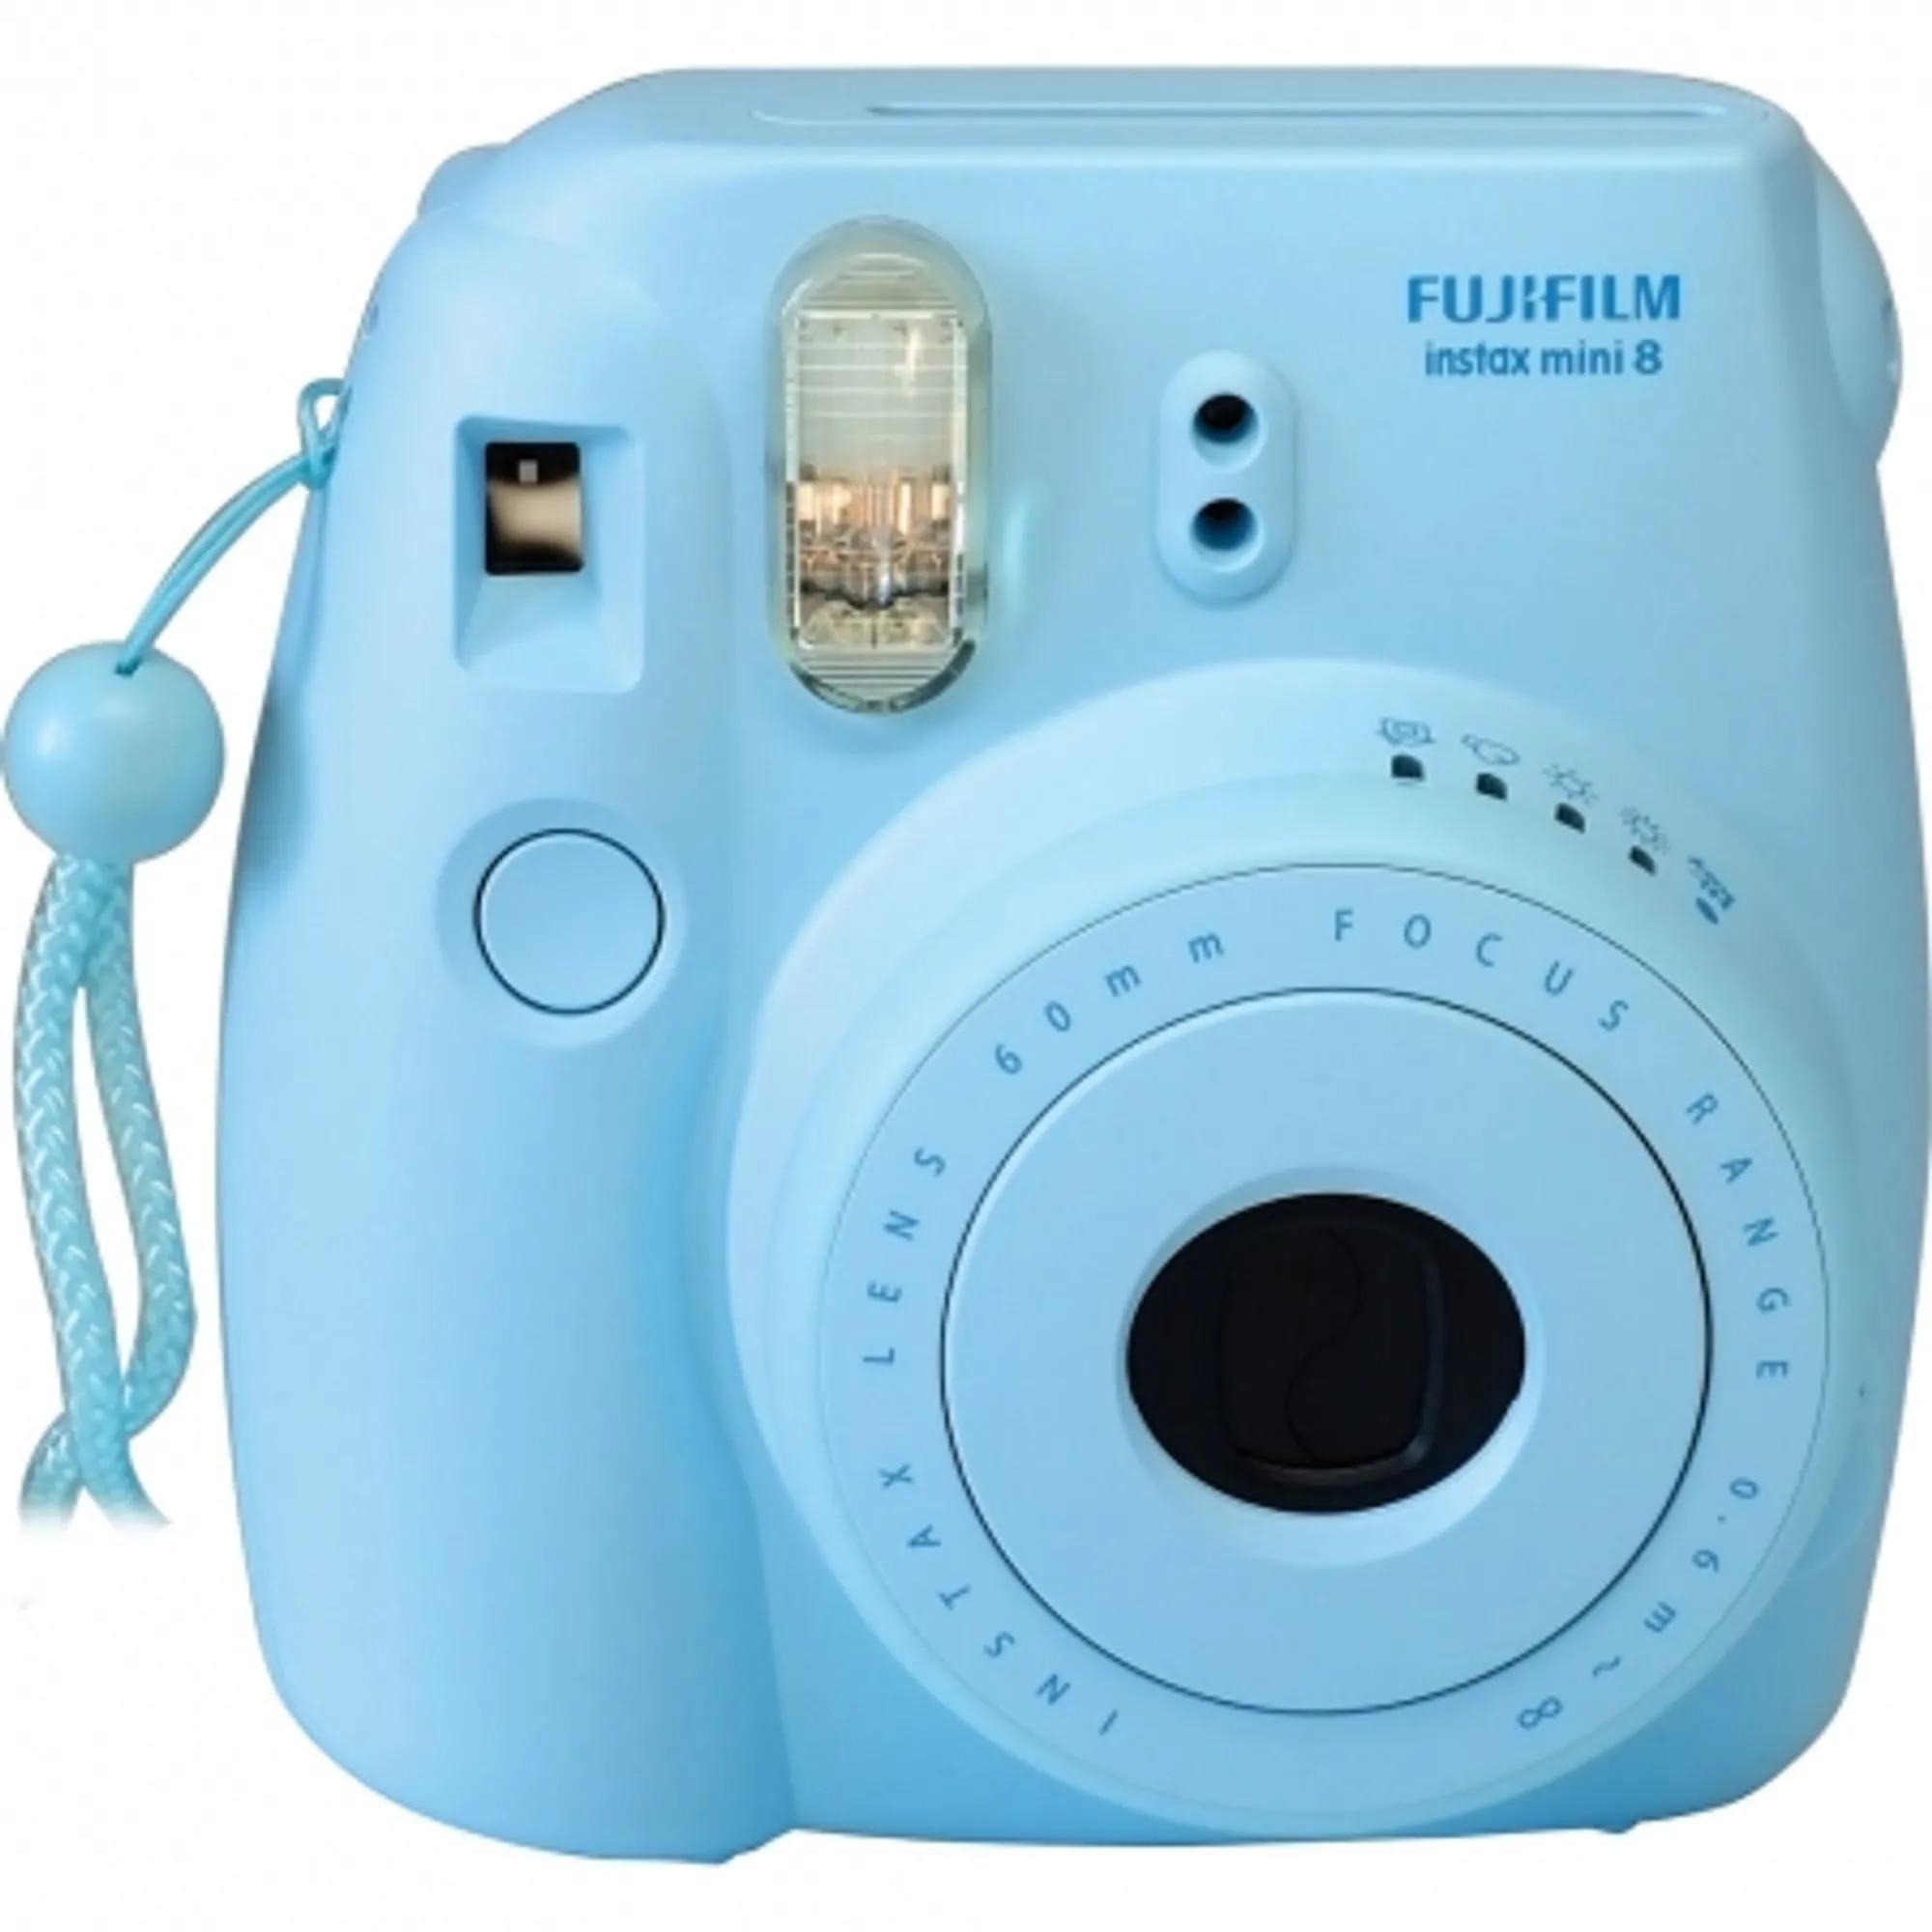 Fotografie Camera foto instant Fujifilm Instax mini 8, Blue